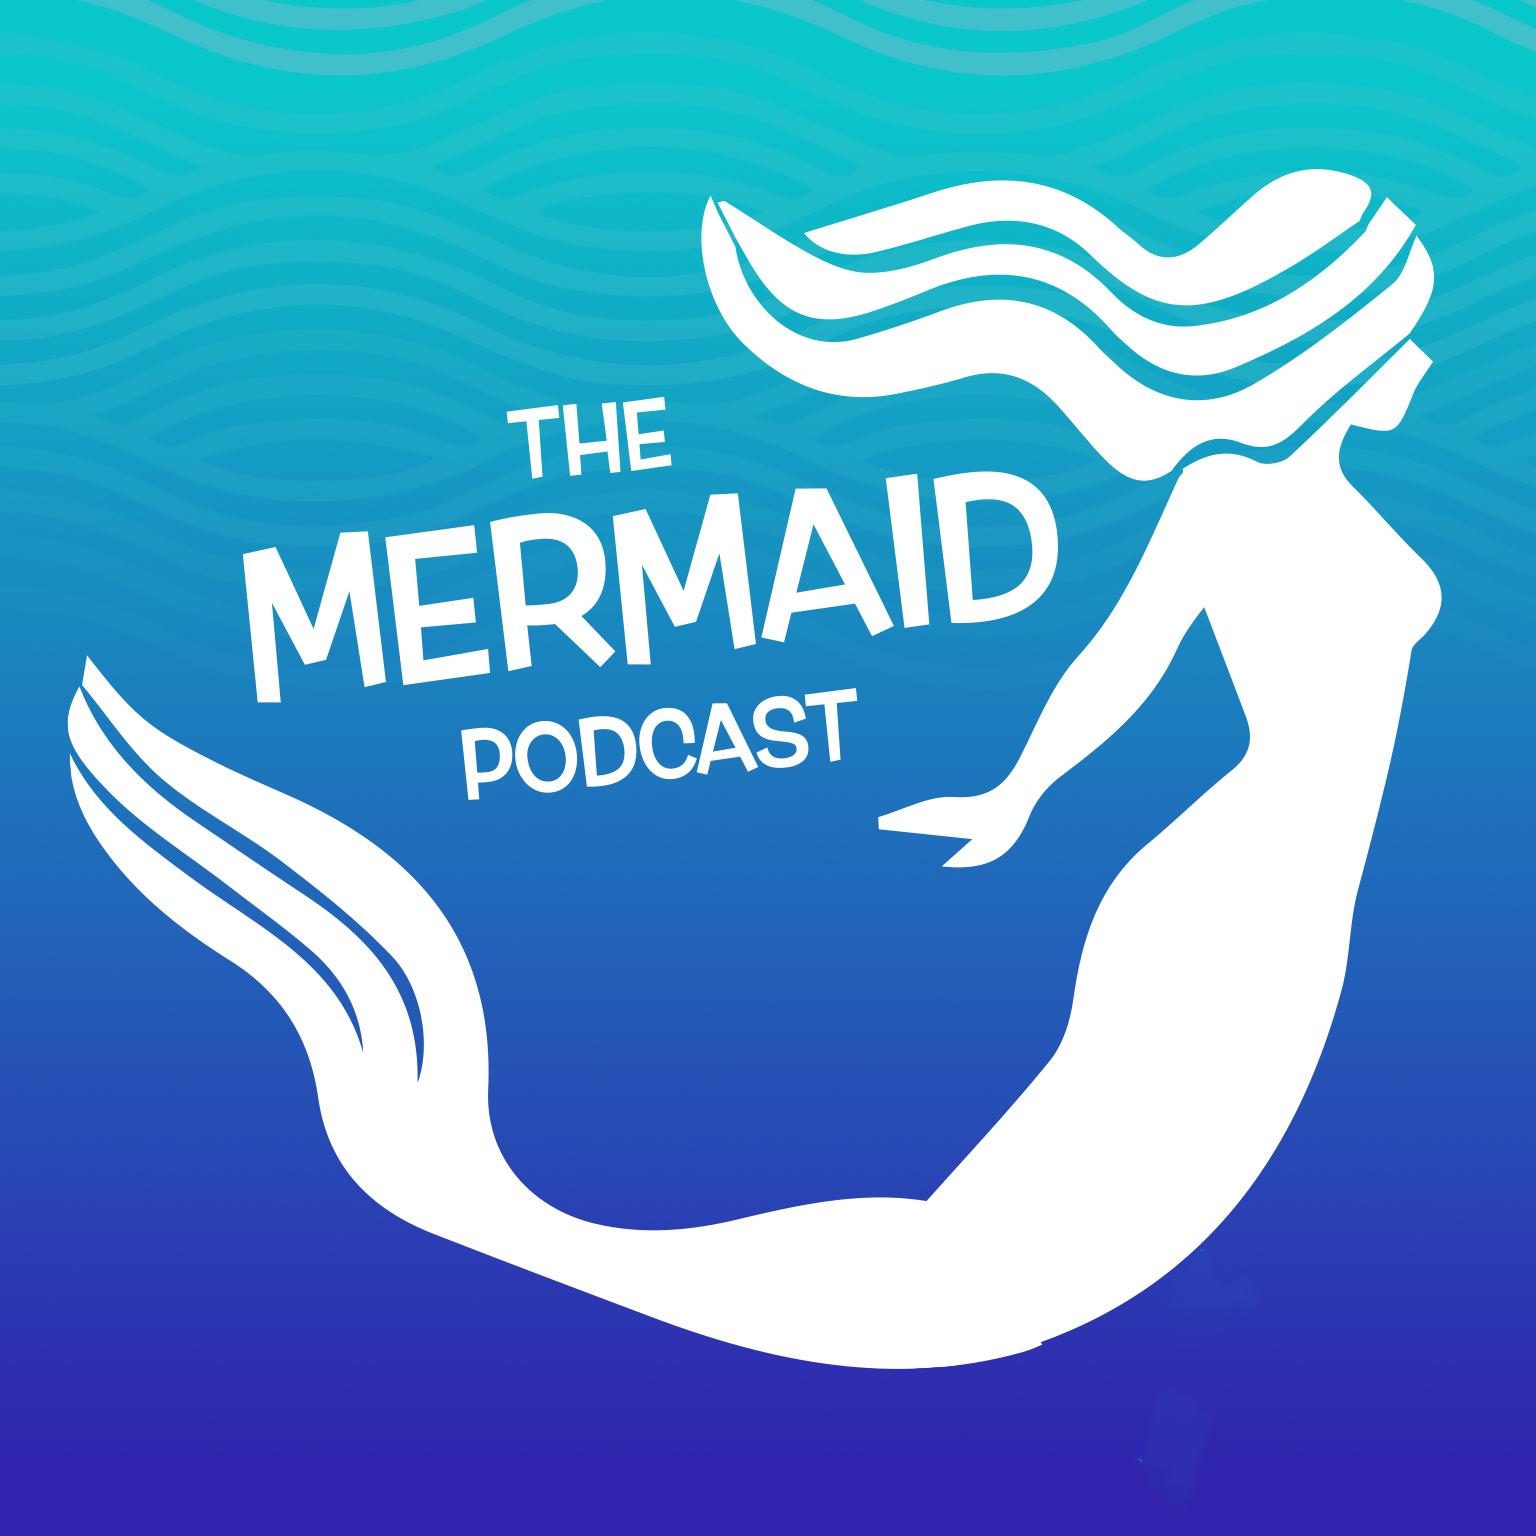 The Mermaid Podcast show art